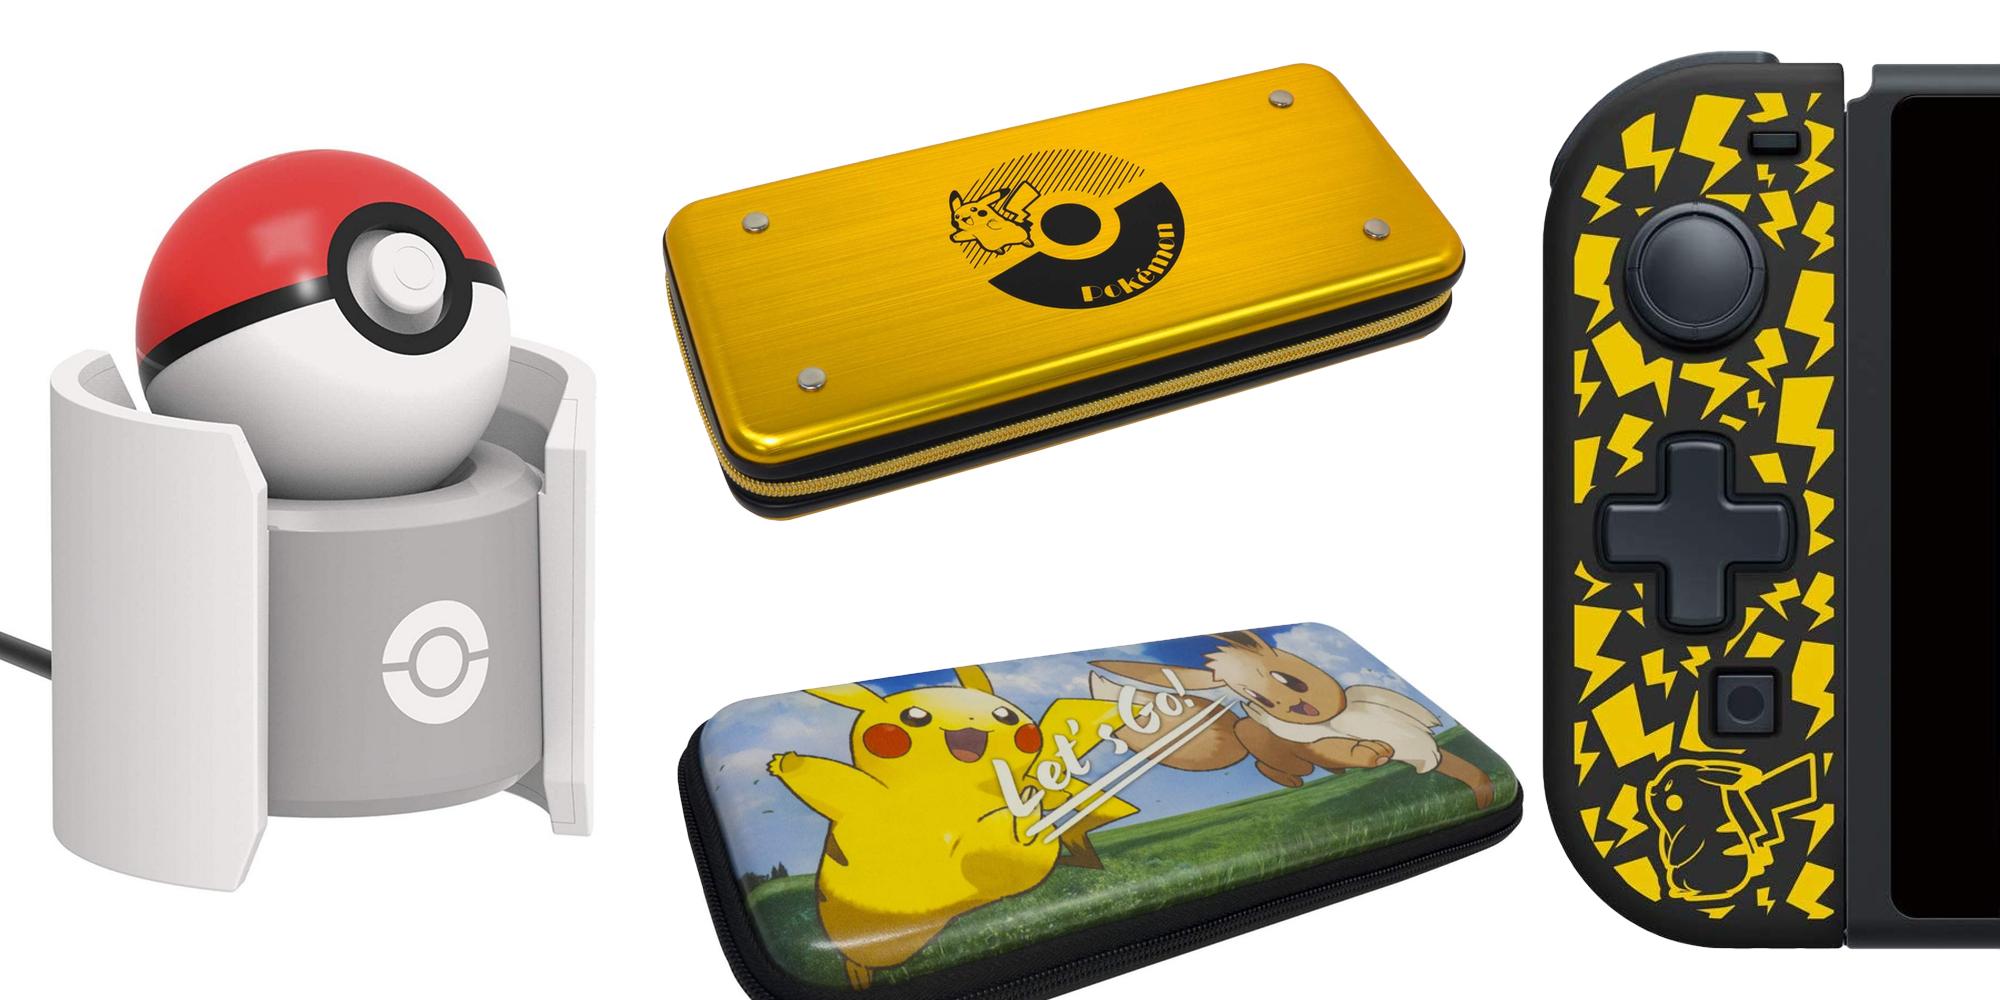 Promotion nintendo switch pack pokemon pas cher, avis nintendo switch us